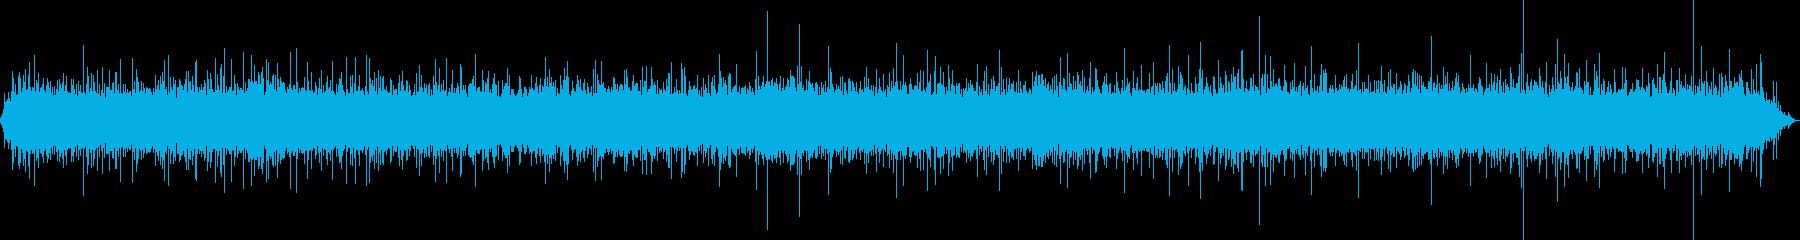 [Natural sound] waterfall 02 (Yamanashi)'s reproduced waveform